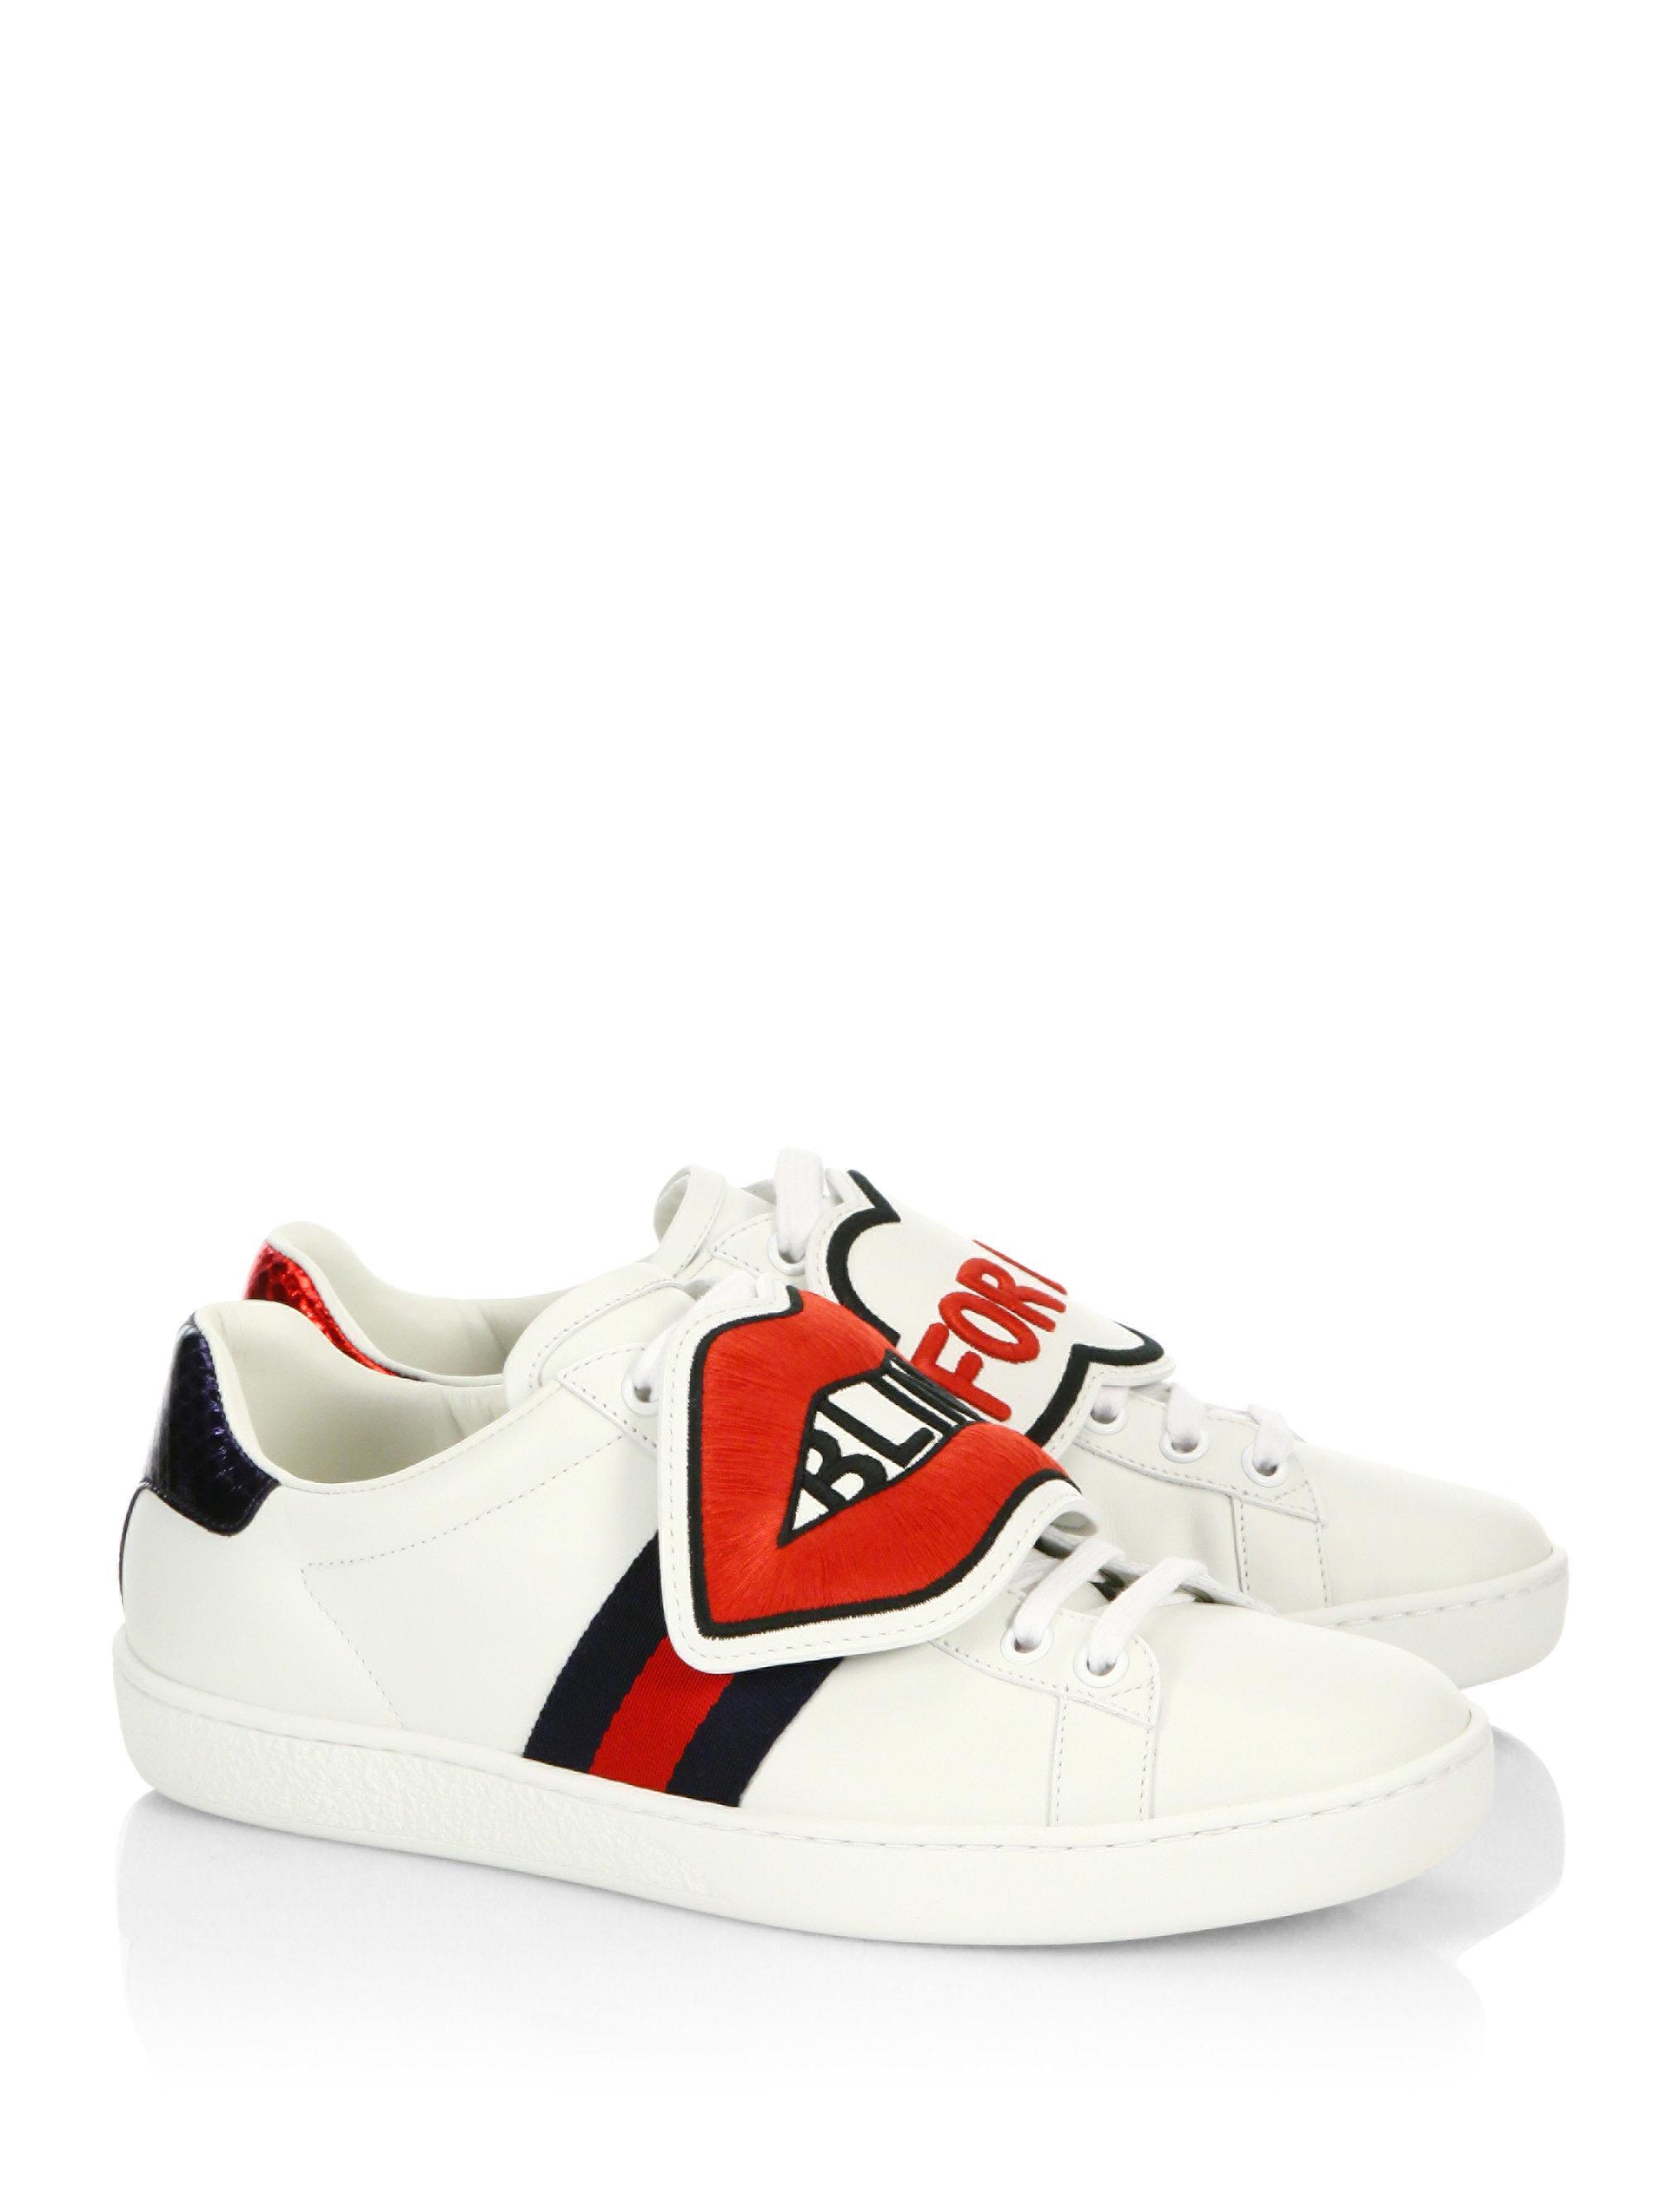 YvpoX55IS3 Womens New Ace Loved Sneaker PihLQoUs